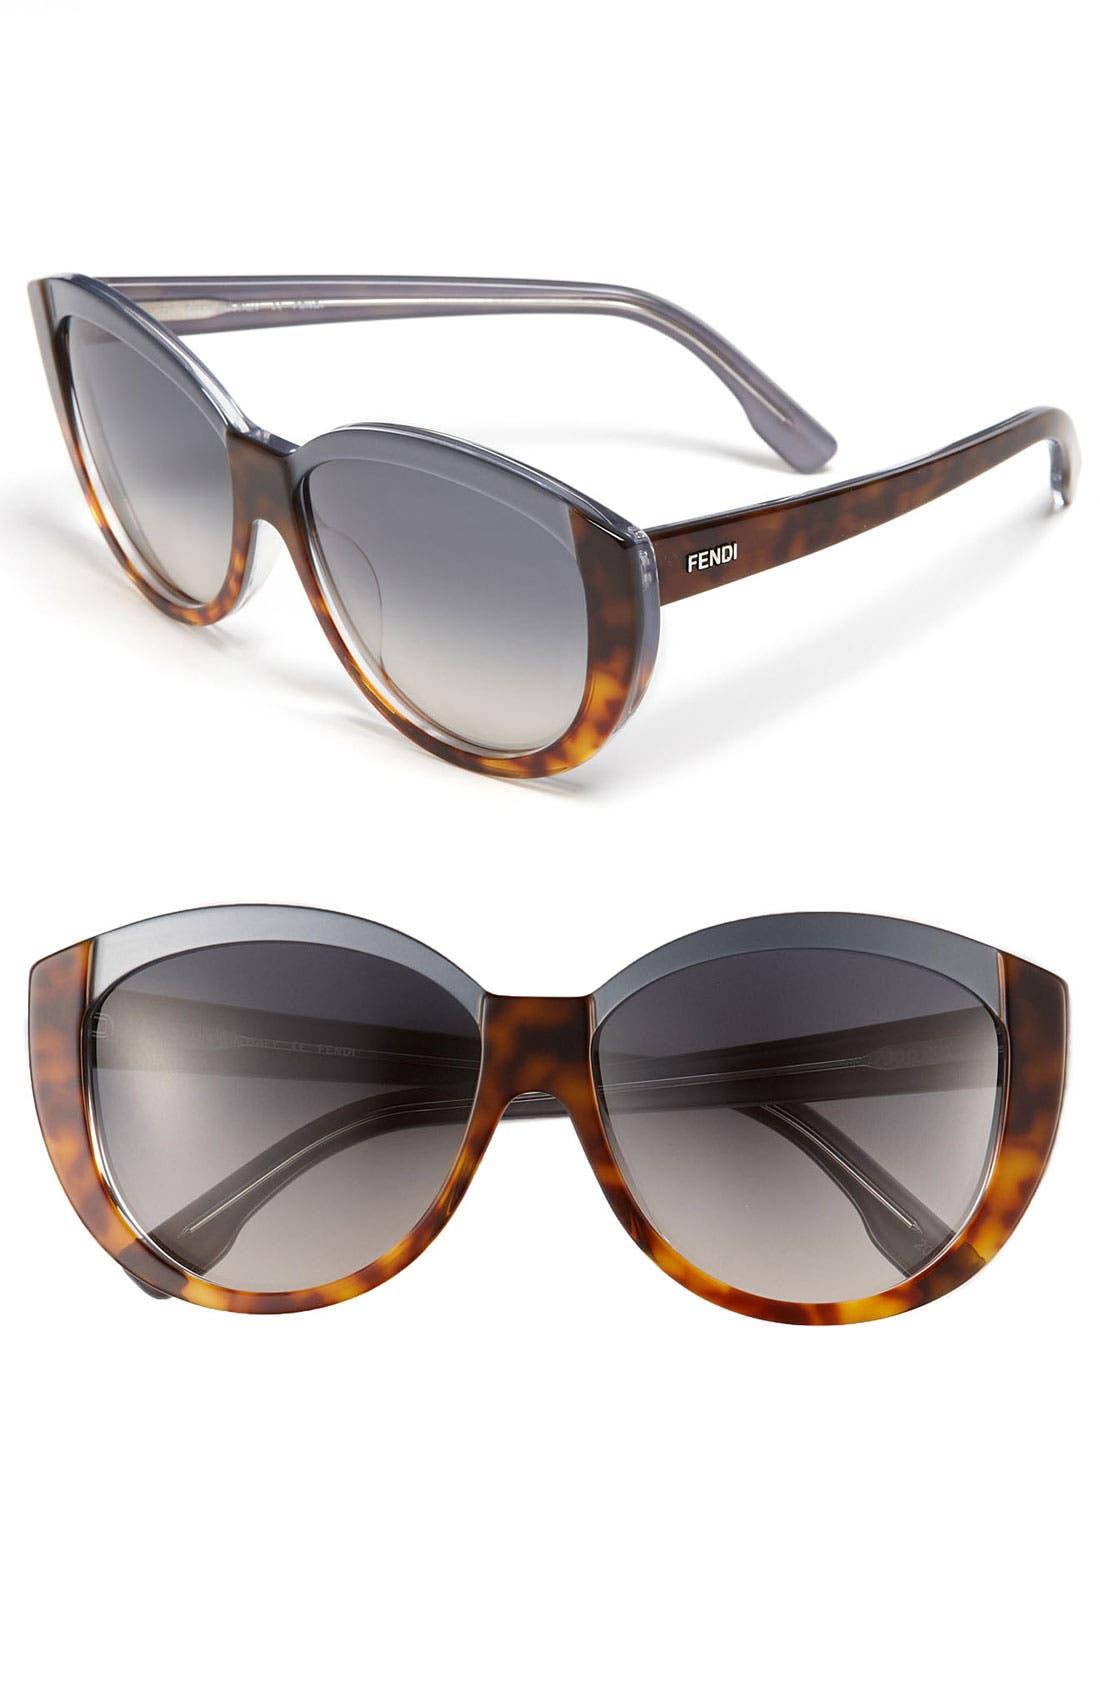 Main Image - Fendi Sunglasses